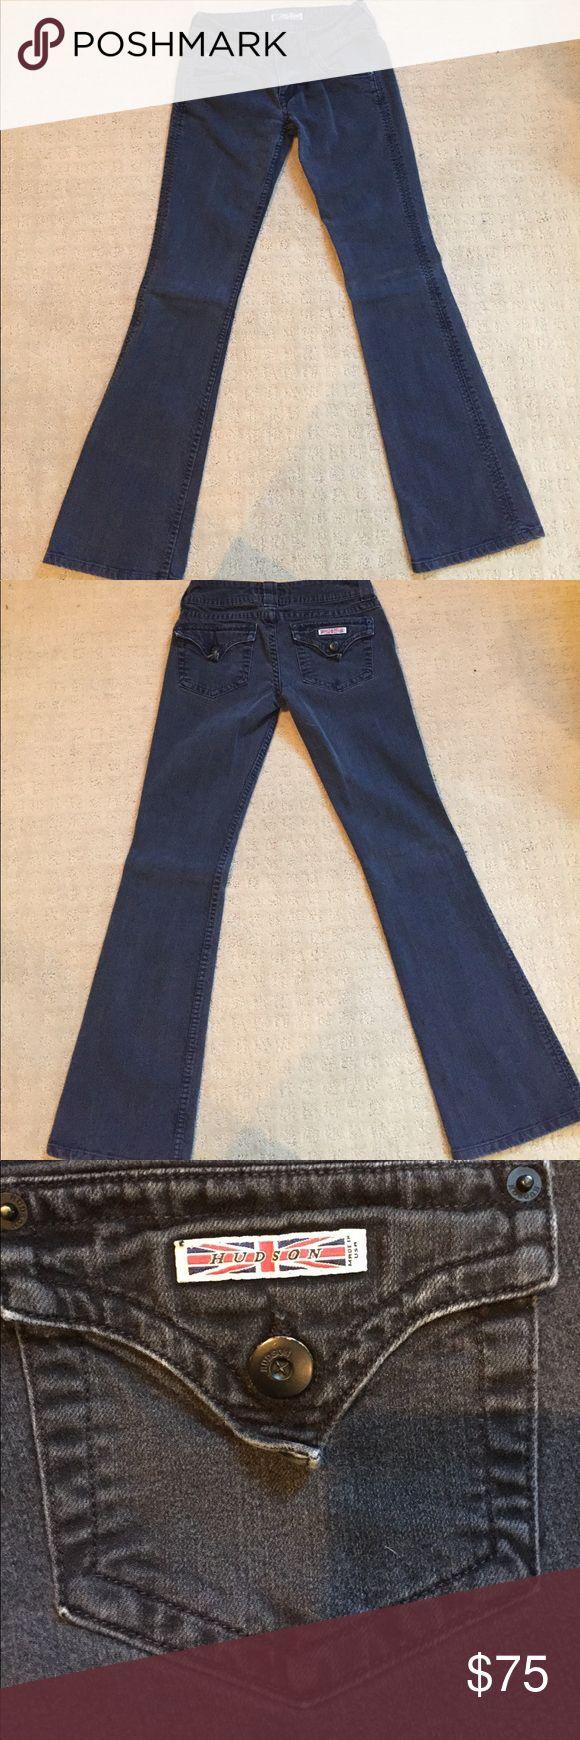 Hudson black bootcut jeans Black Hudson black bootcut flap back pocket jeans. Size 26. Hudson Jeans Jeans Boot Cut